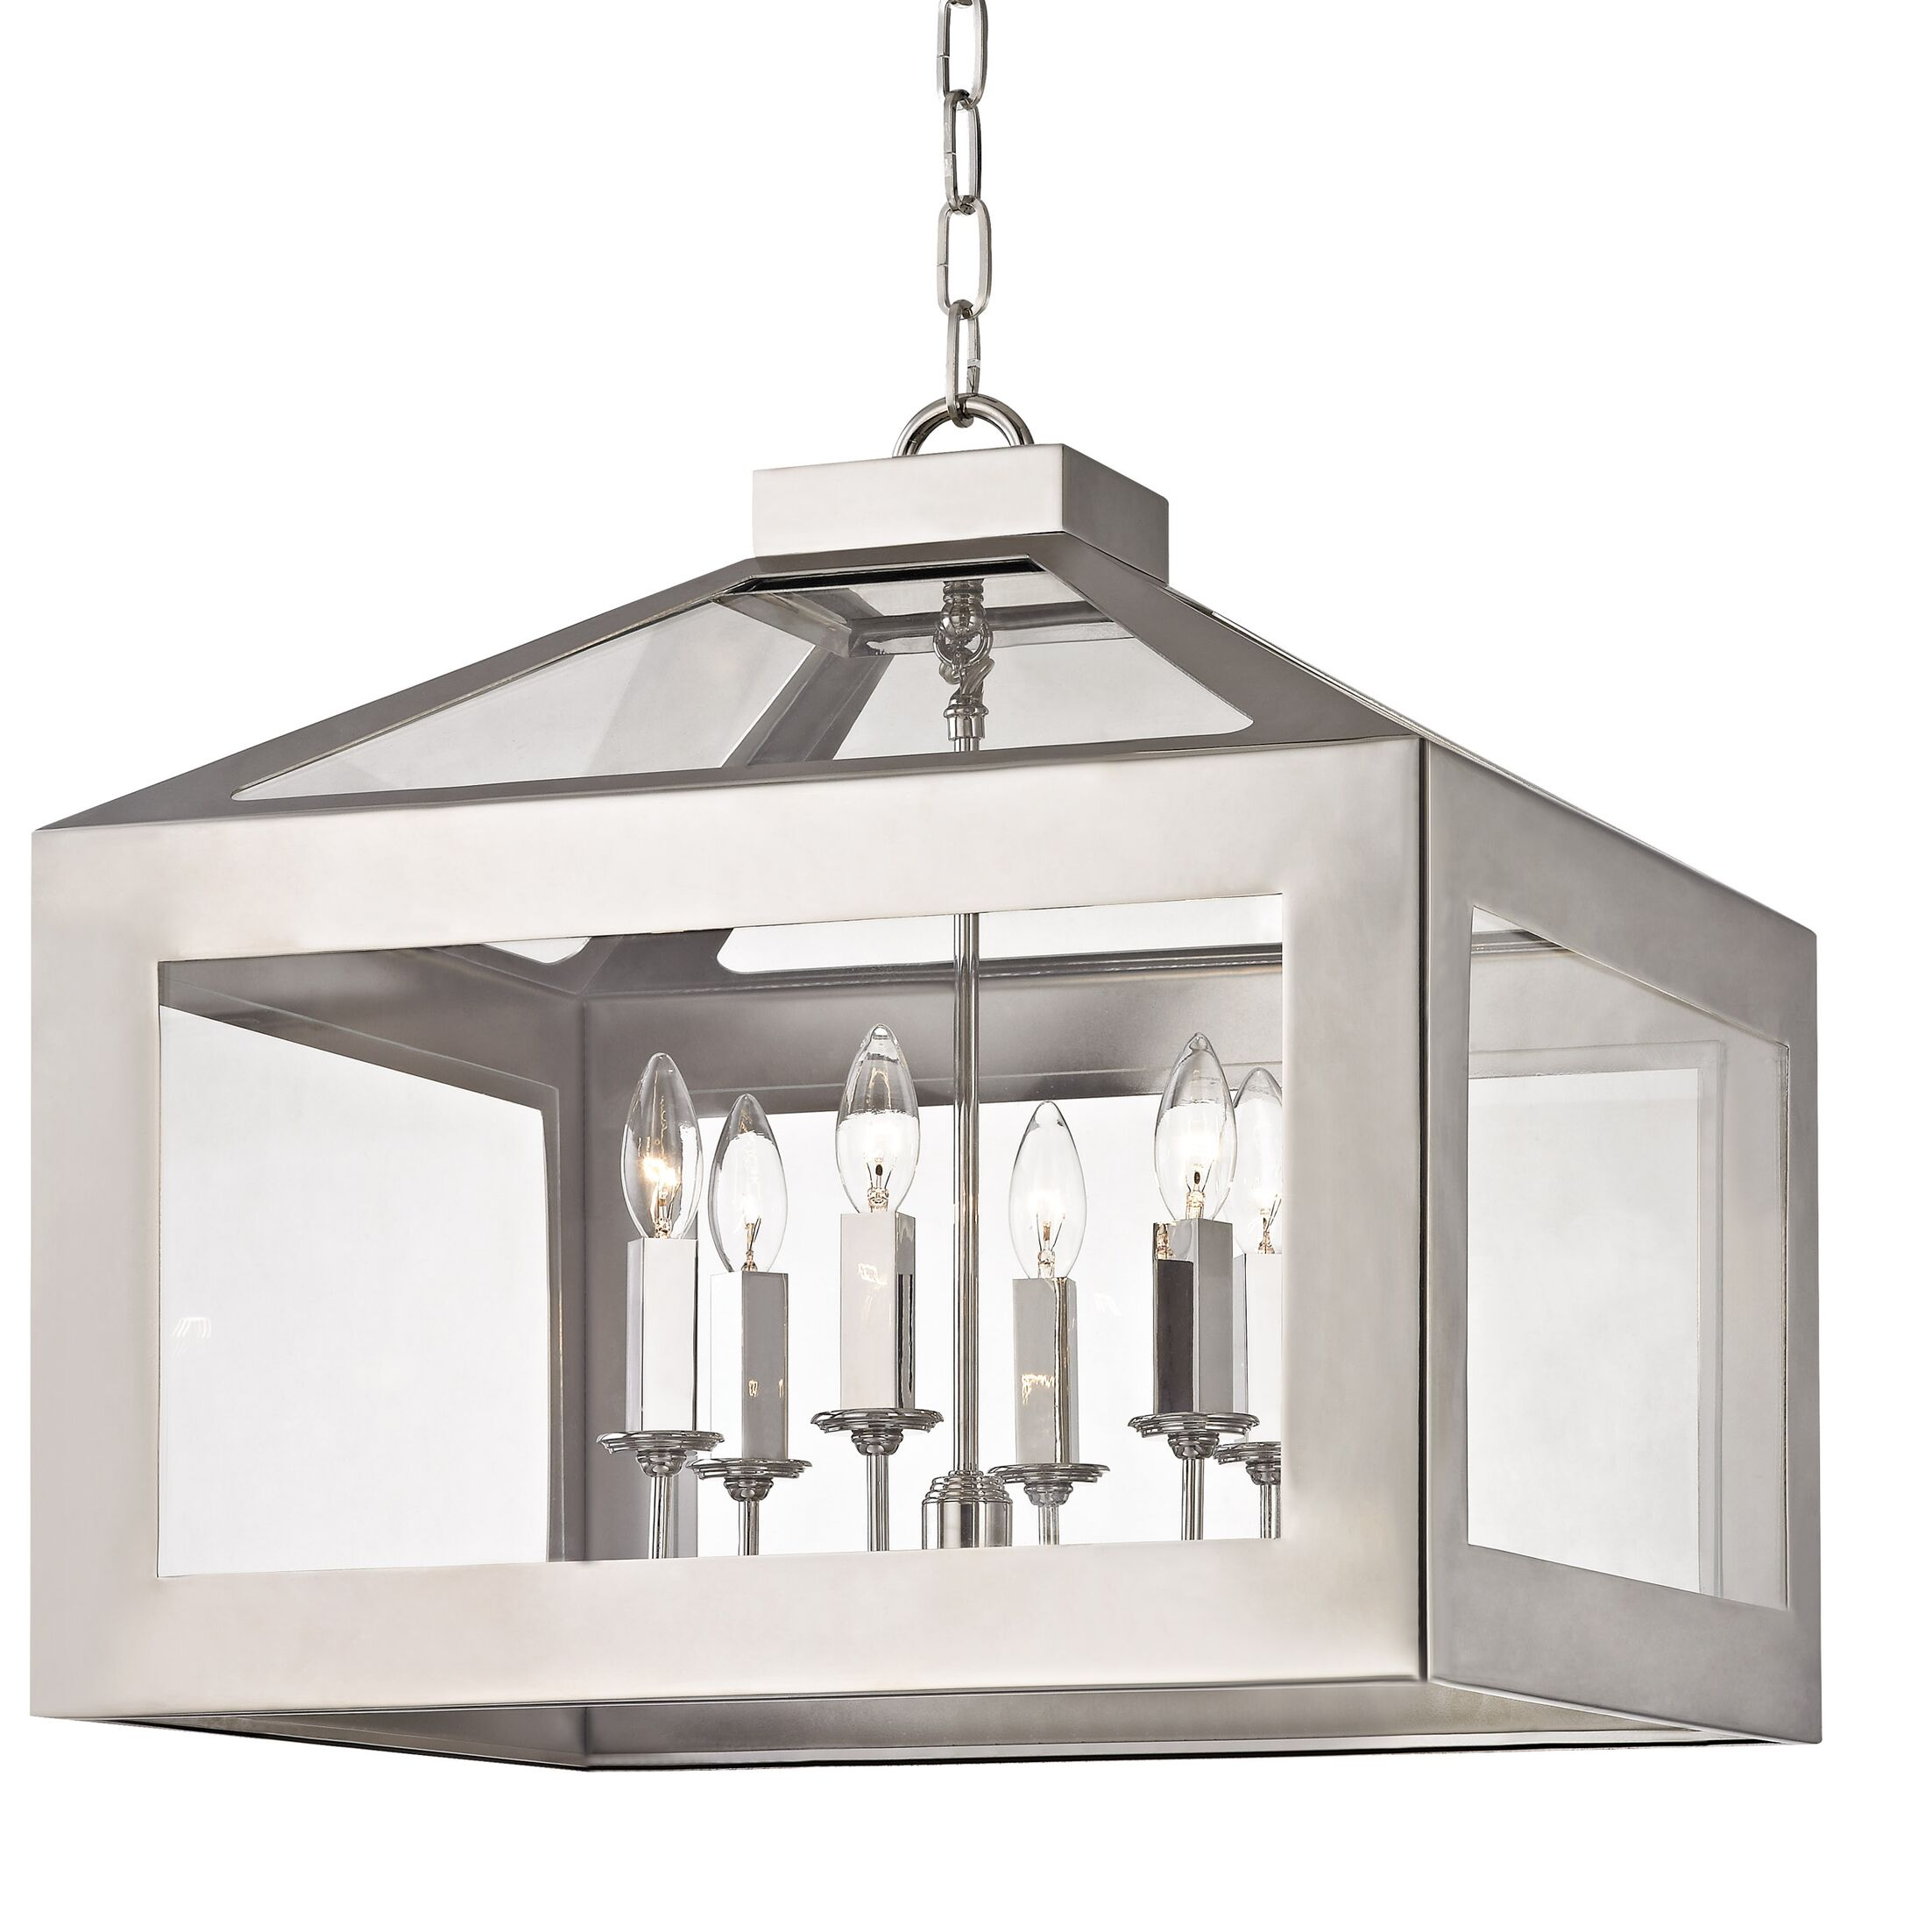 Artus 6-Light Lantern Pendant